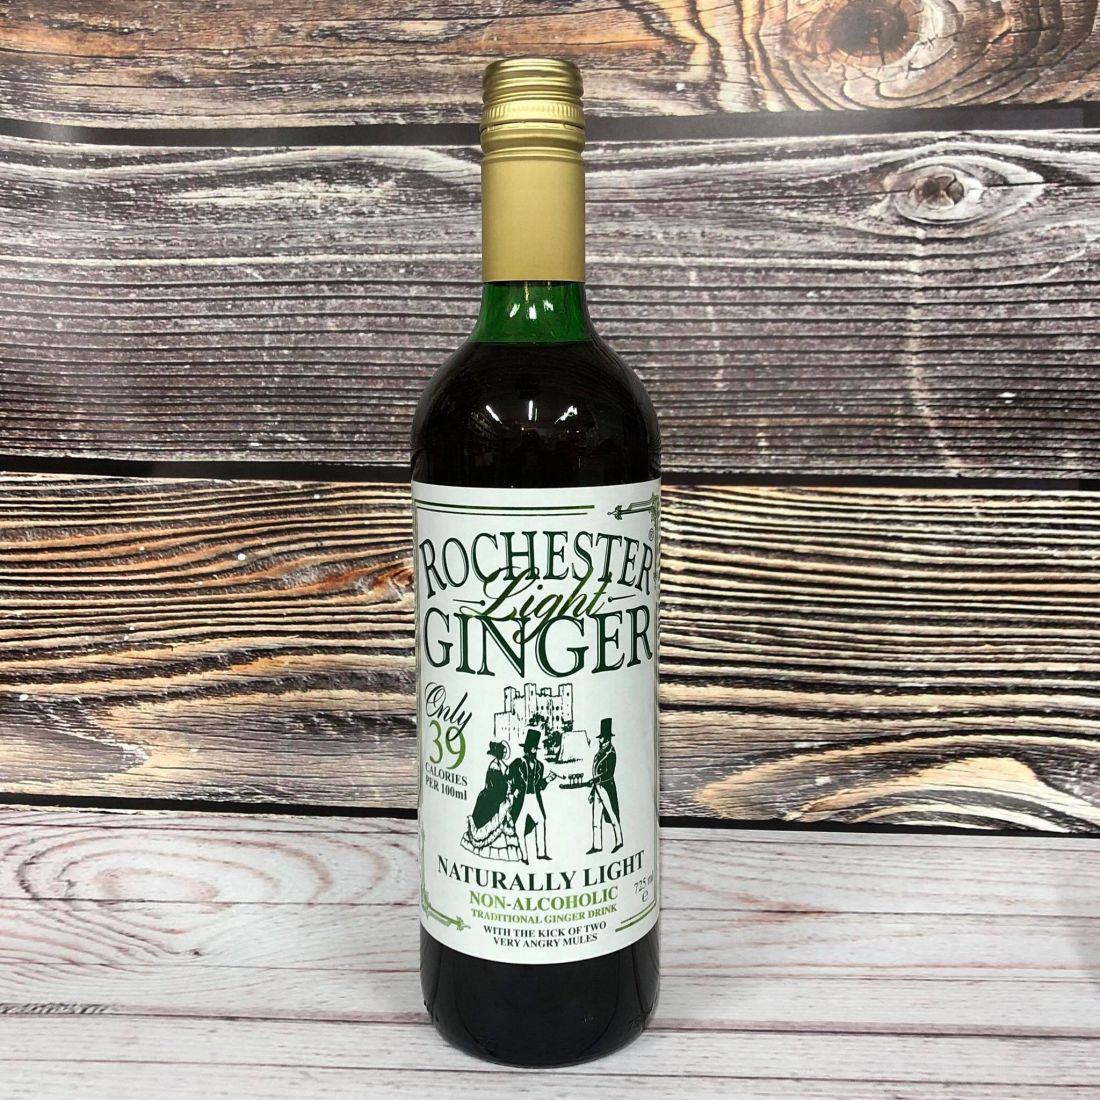 Rochester Light Ginger Безалкогольный Имбирный напиток - 725 мл